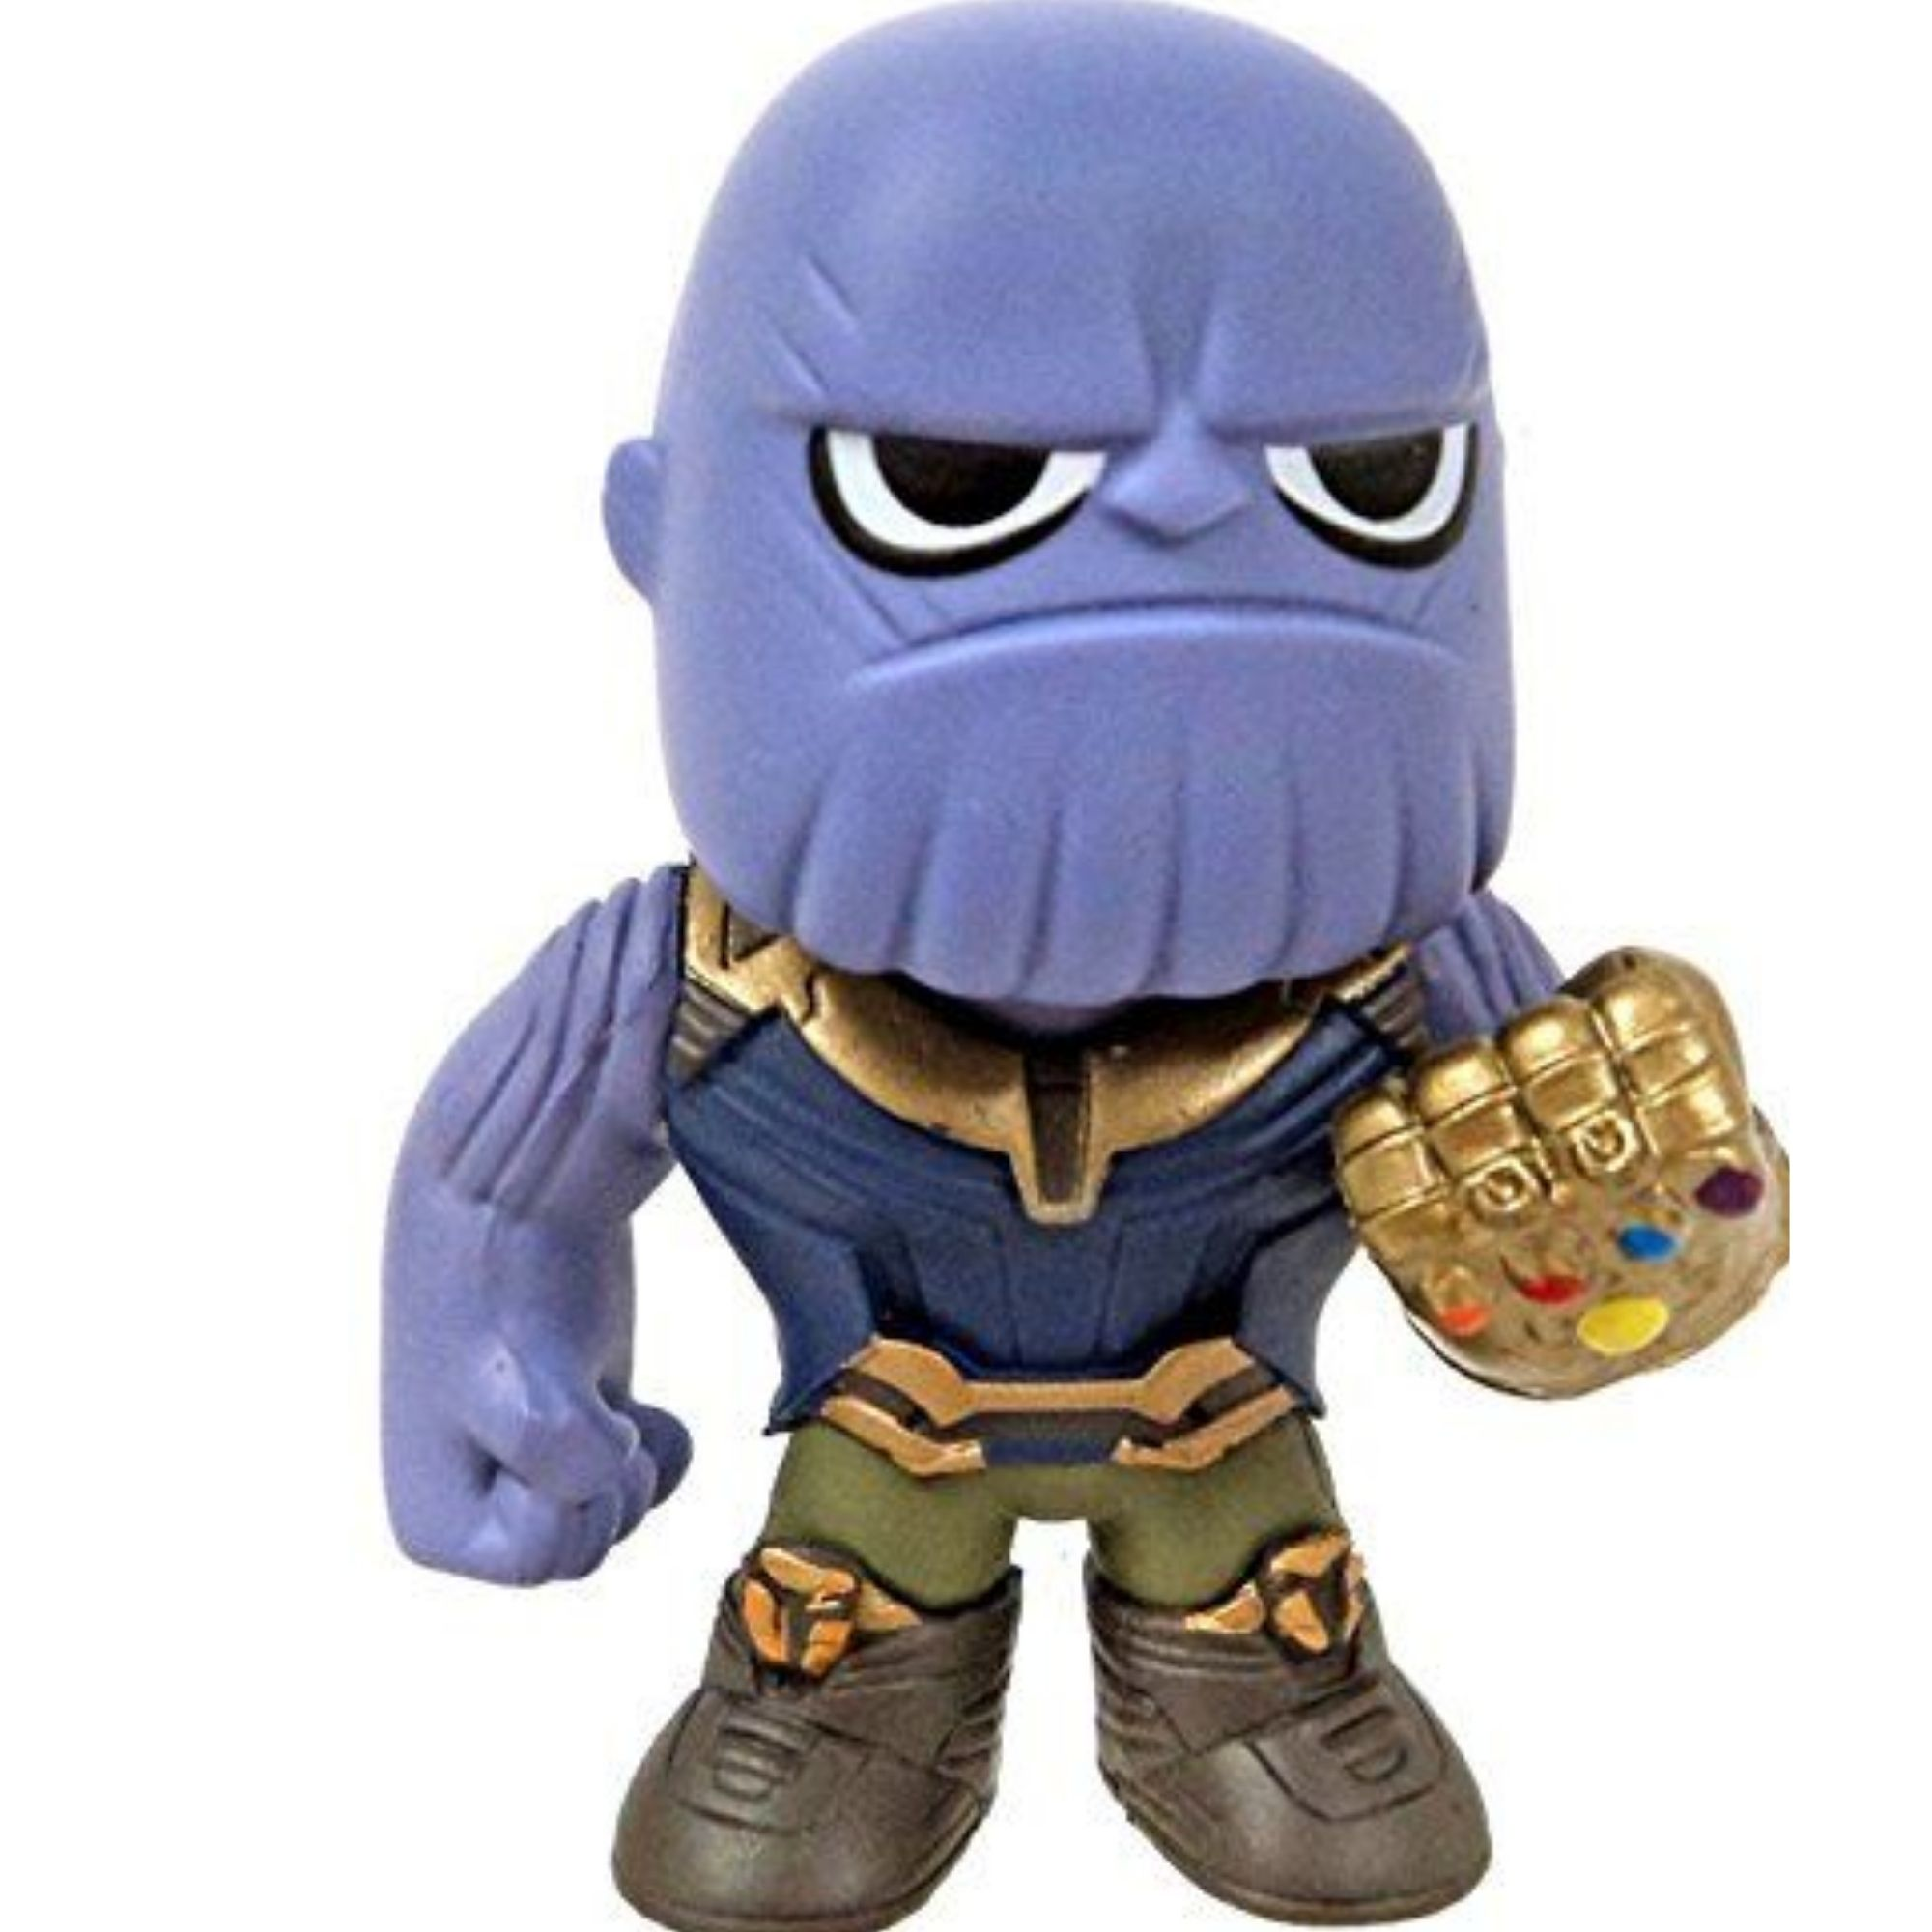 Funko Mini Mystery Marvel Bobble-Head Thanos  - Game Land Brinquedos